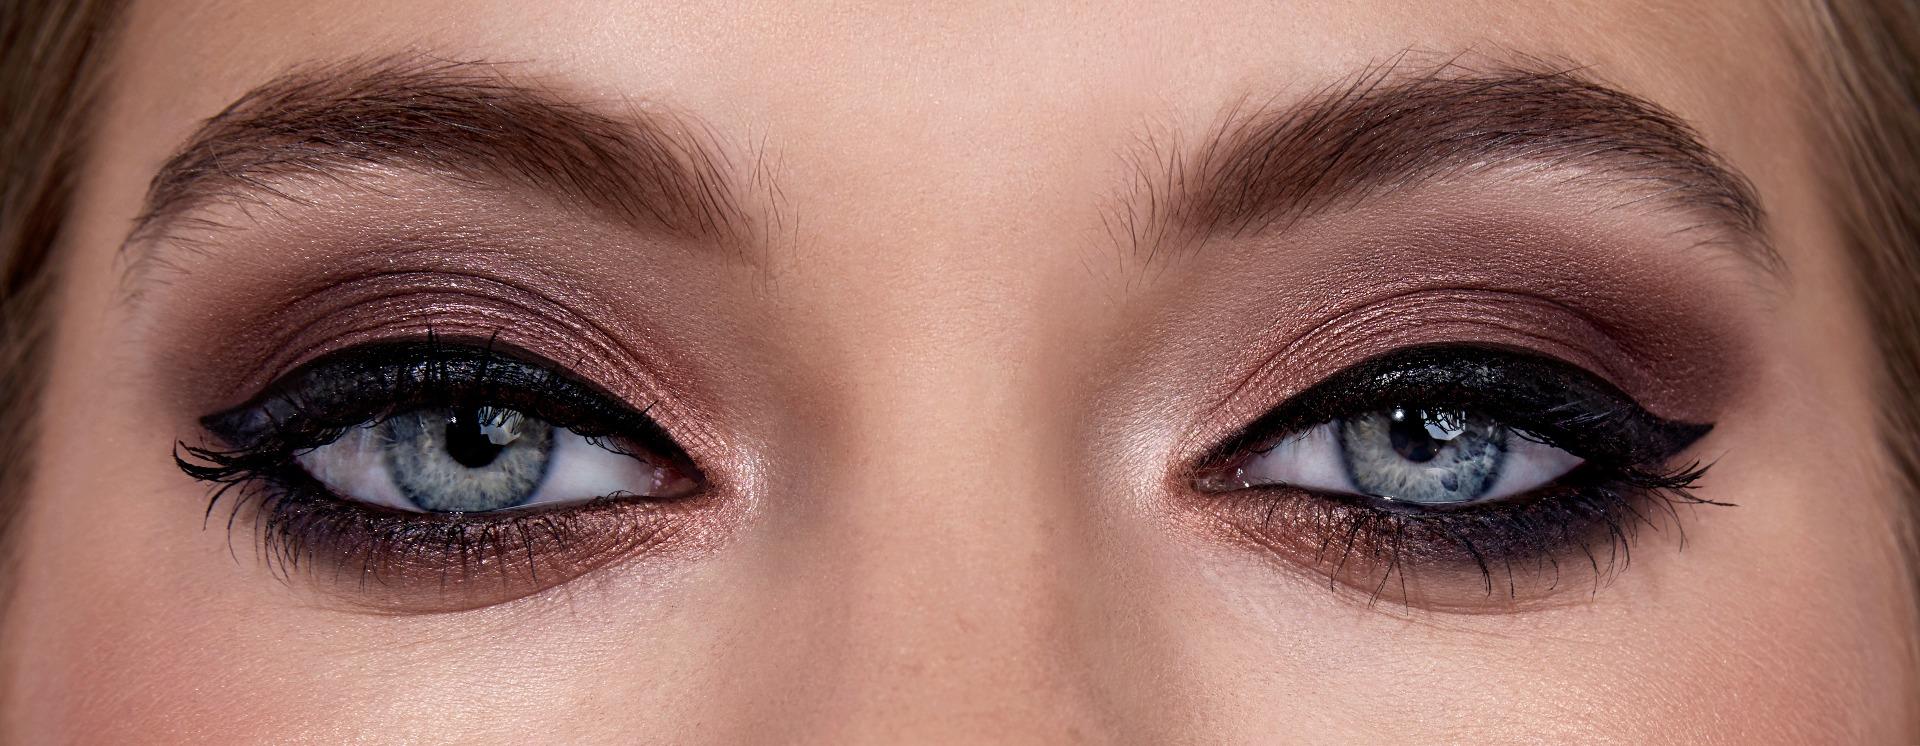 Makeup on Blonde Hair & Blue Eyes